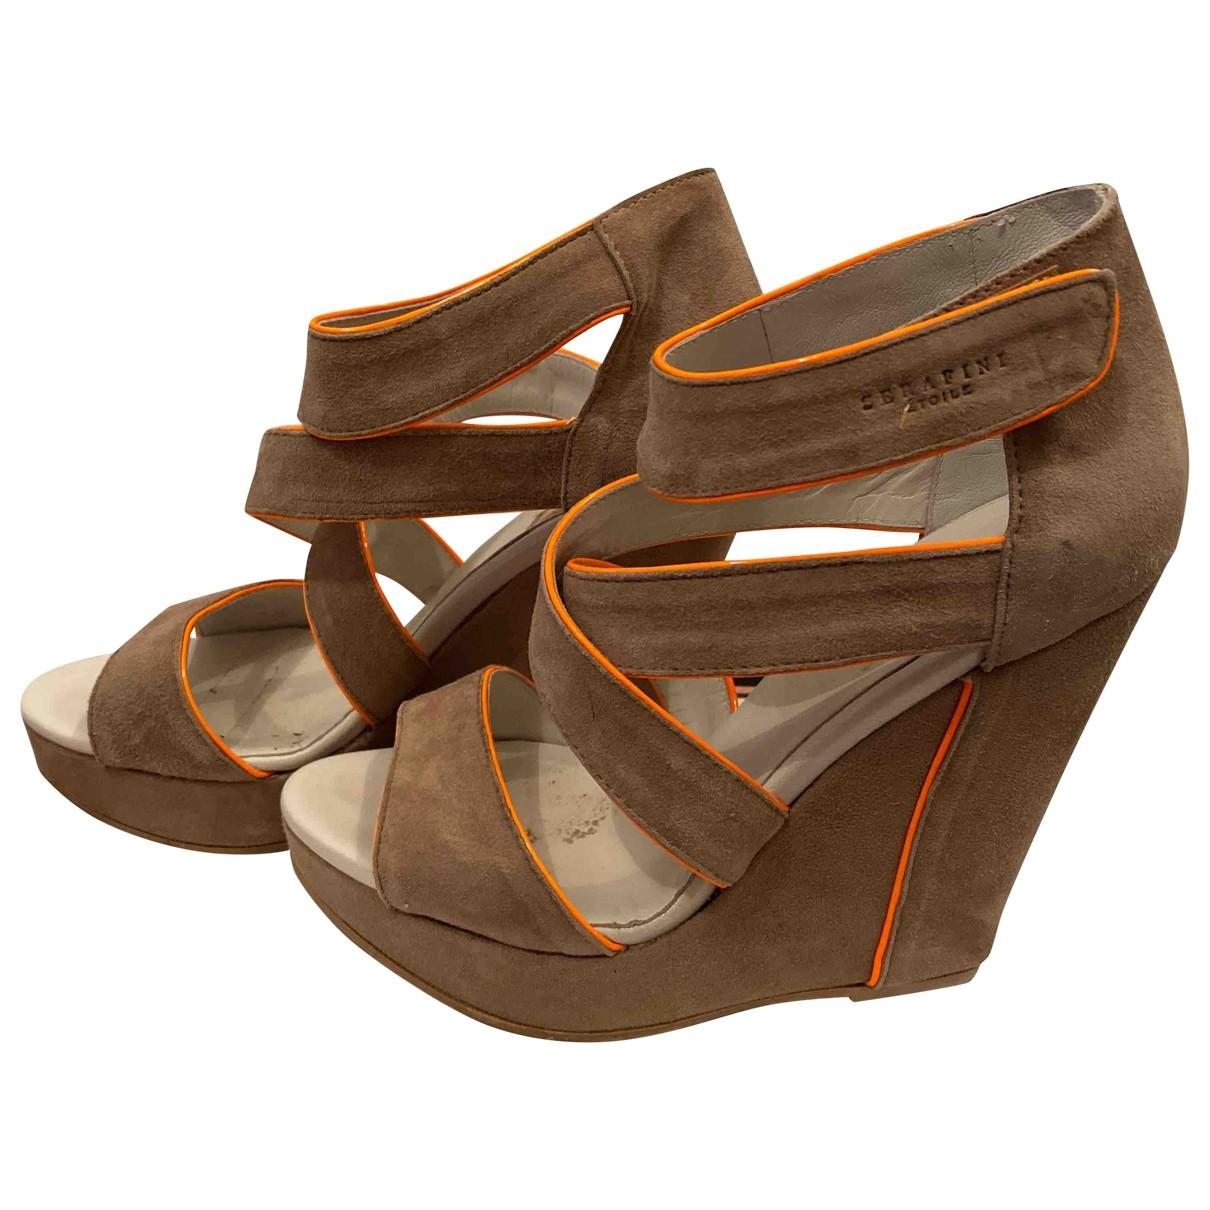 Serafini - Sandales   pour femme en suede - beige